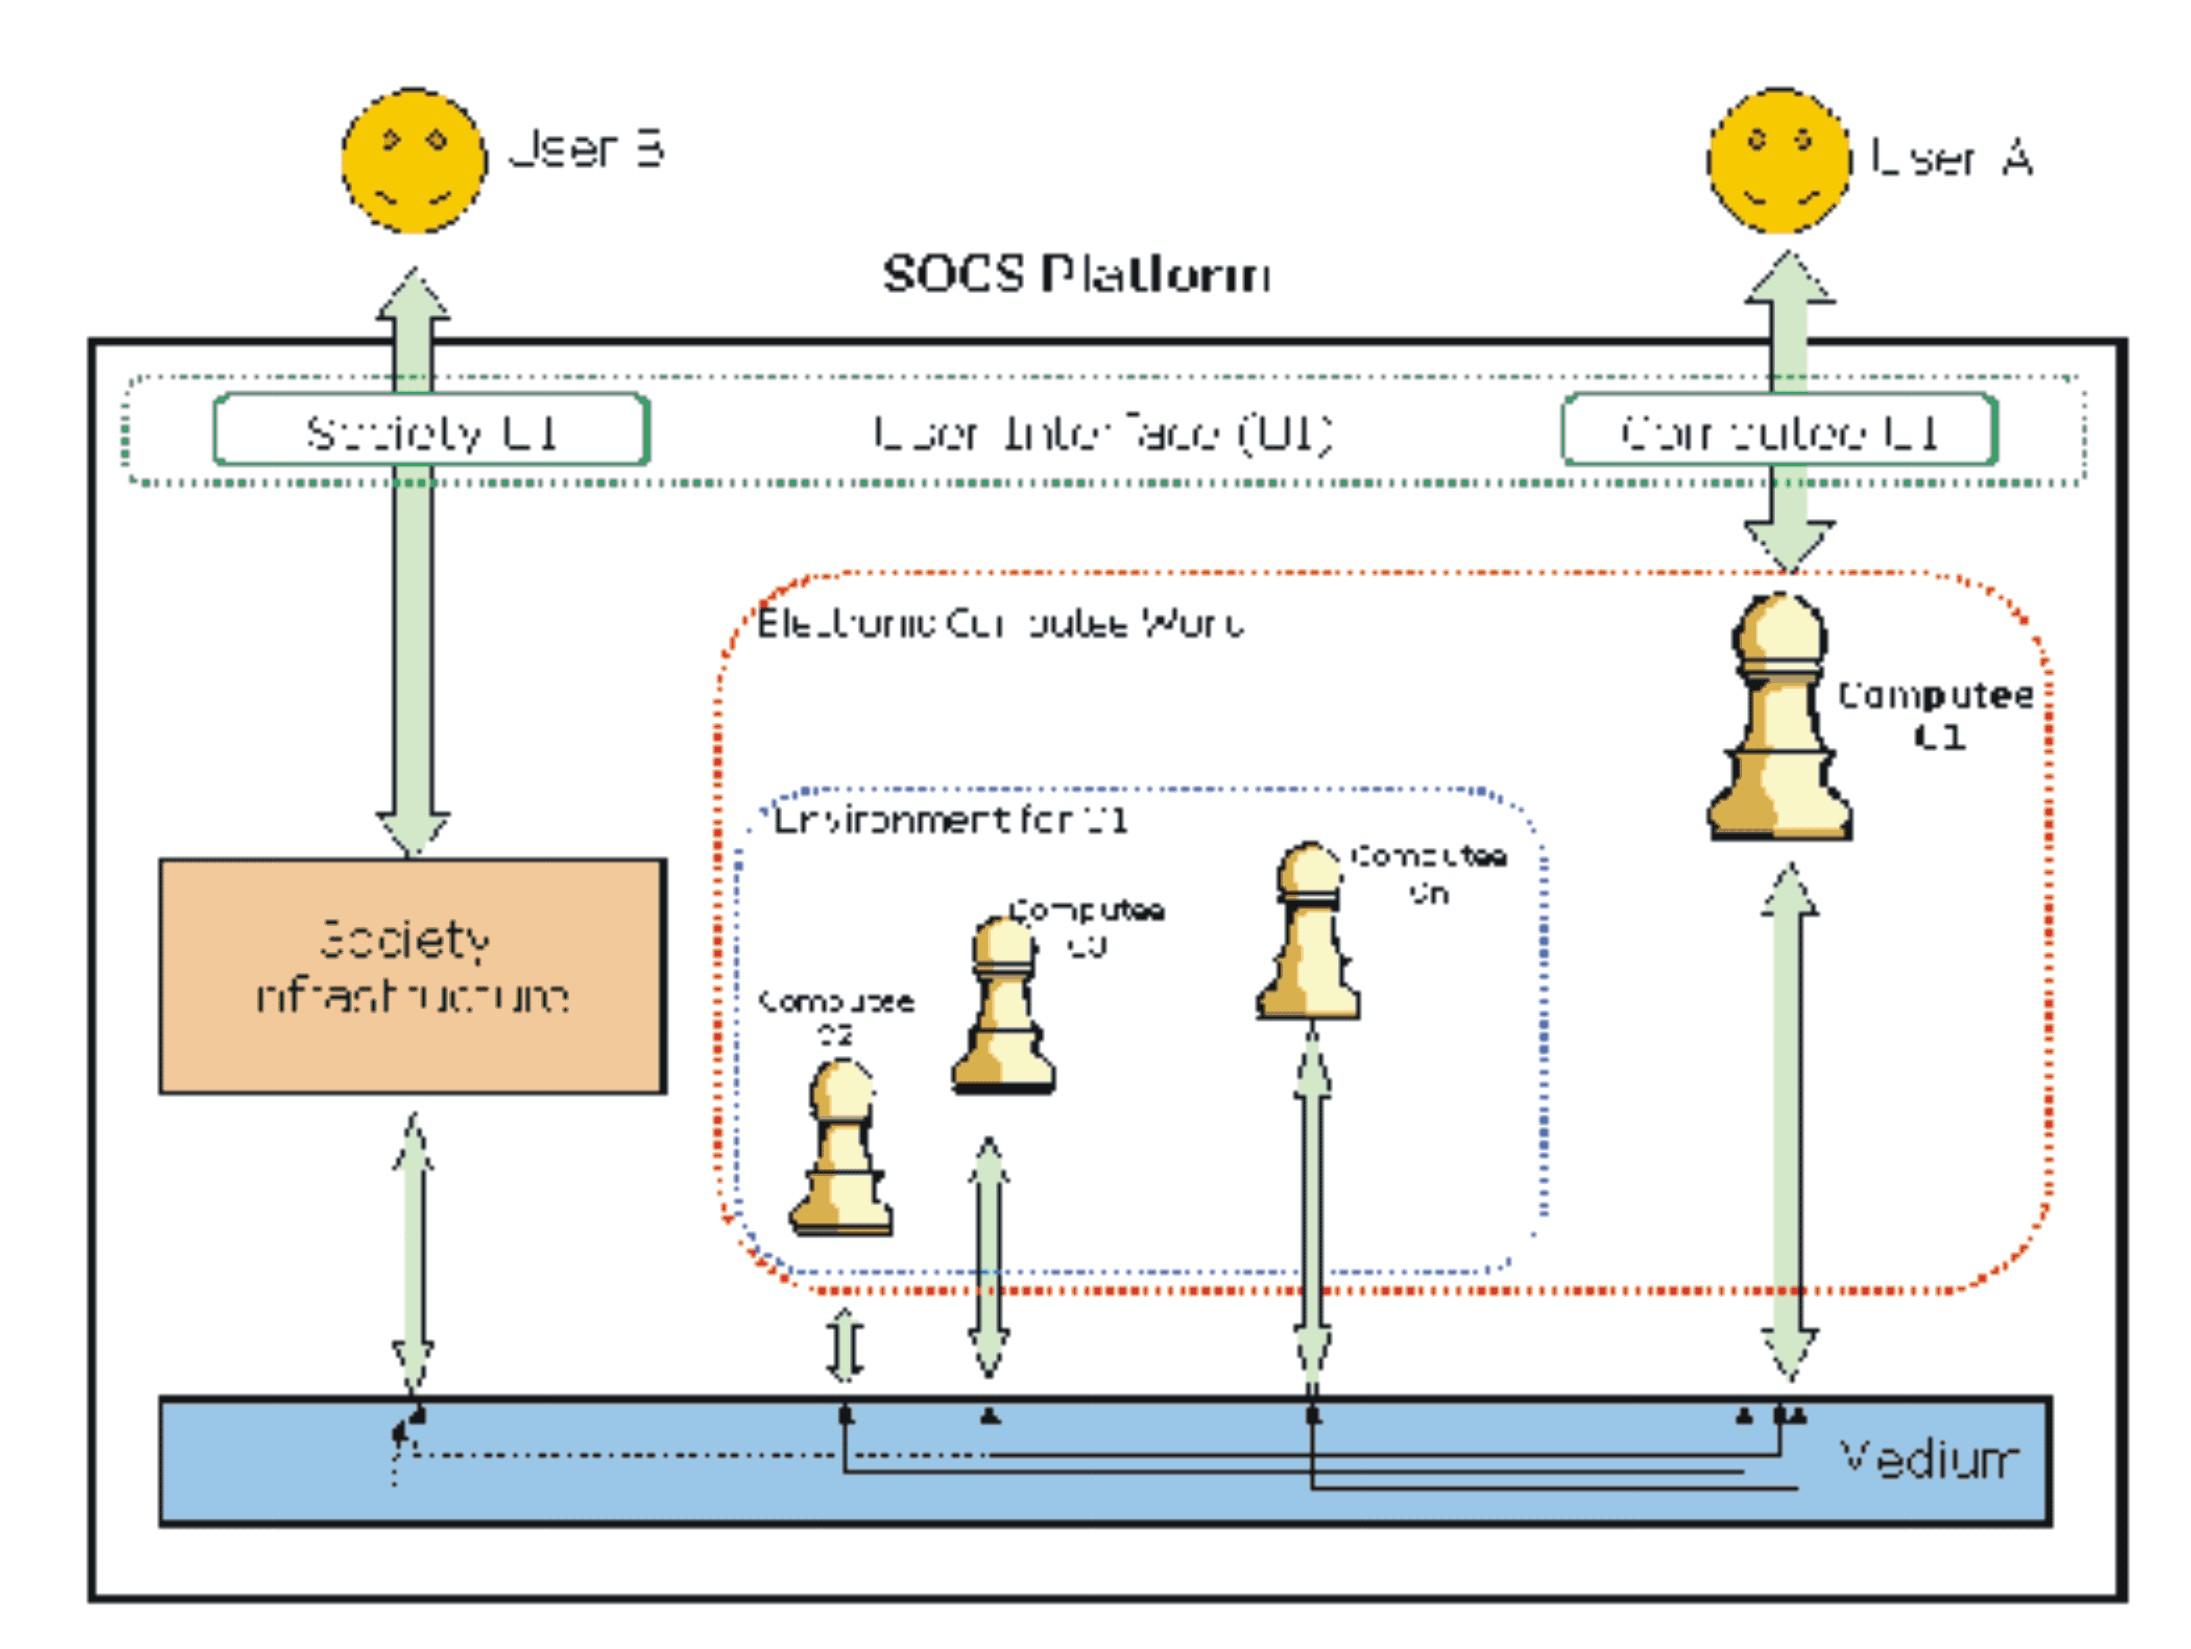 Print Version Schema Of Origami Mobile Crane 2 Conceptual Organization Prosocs